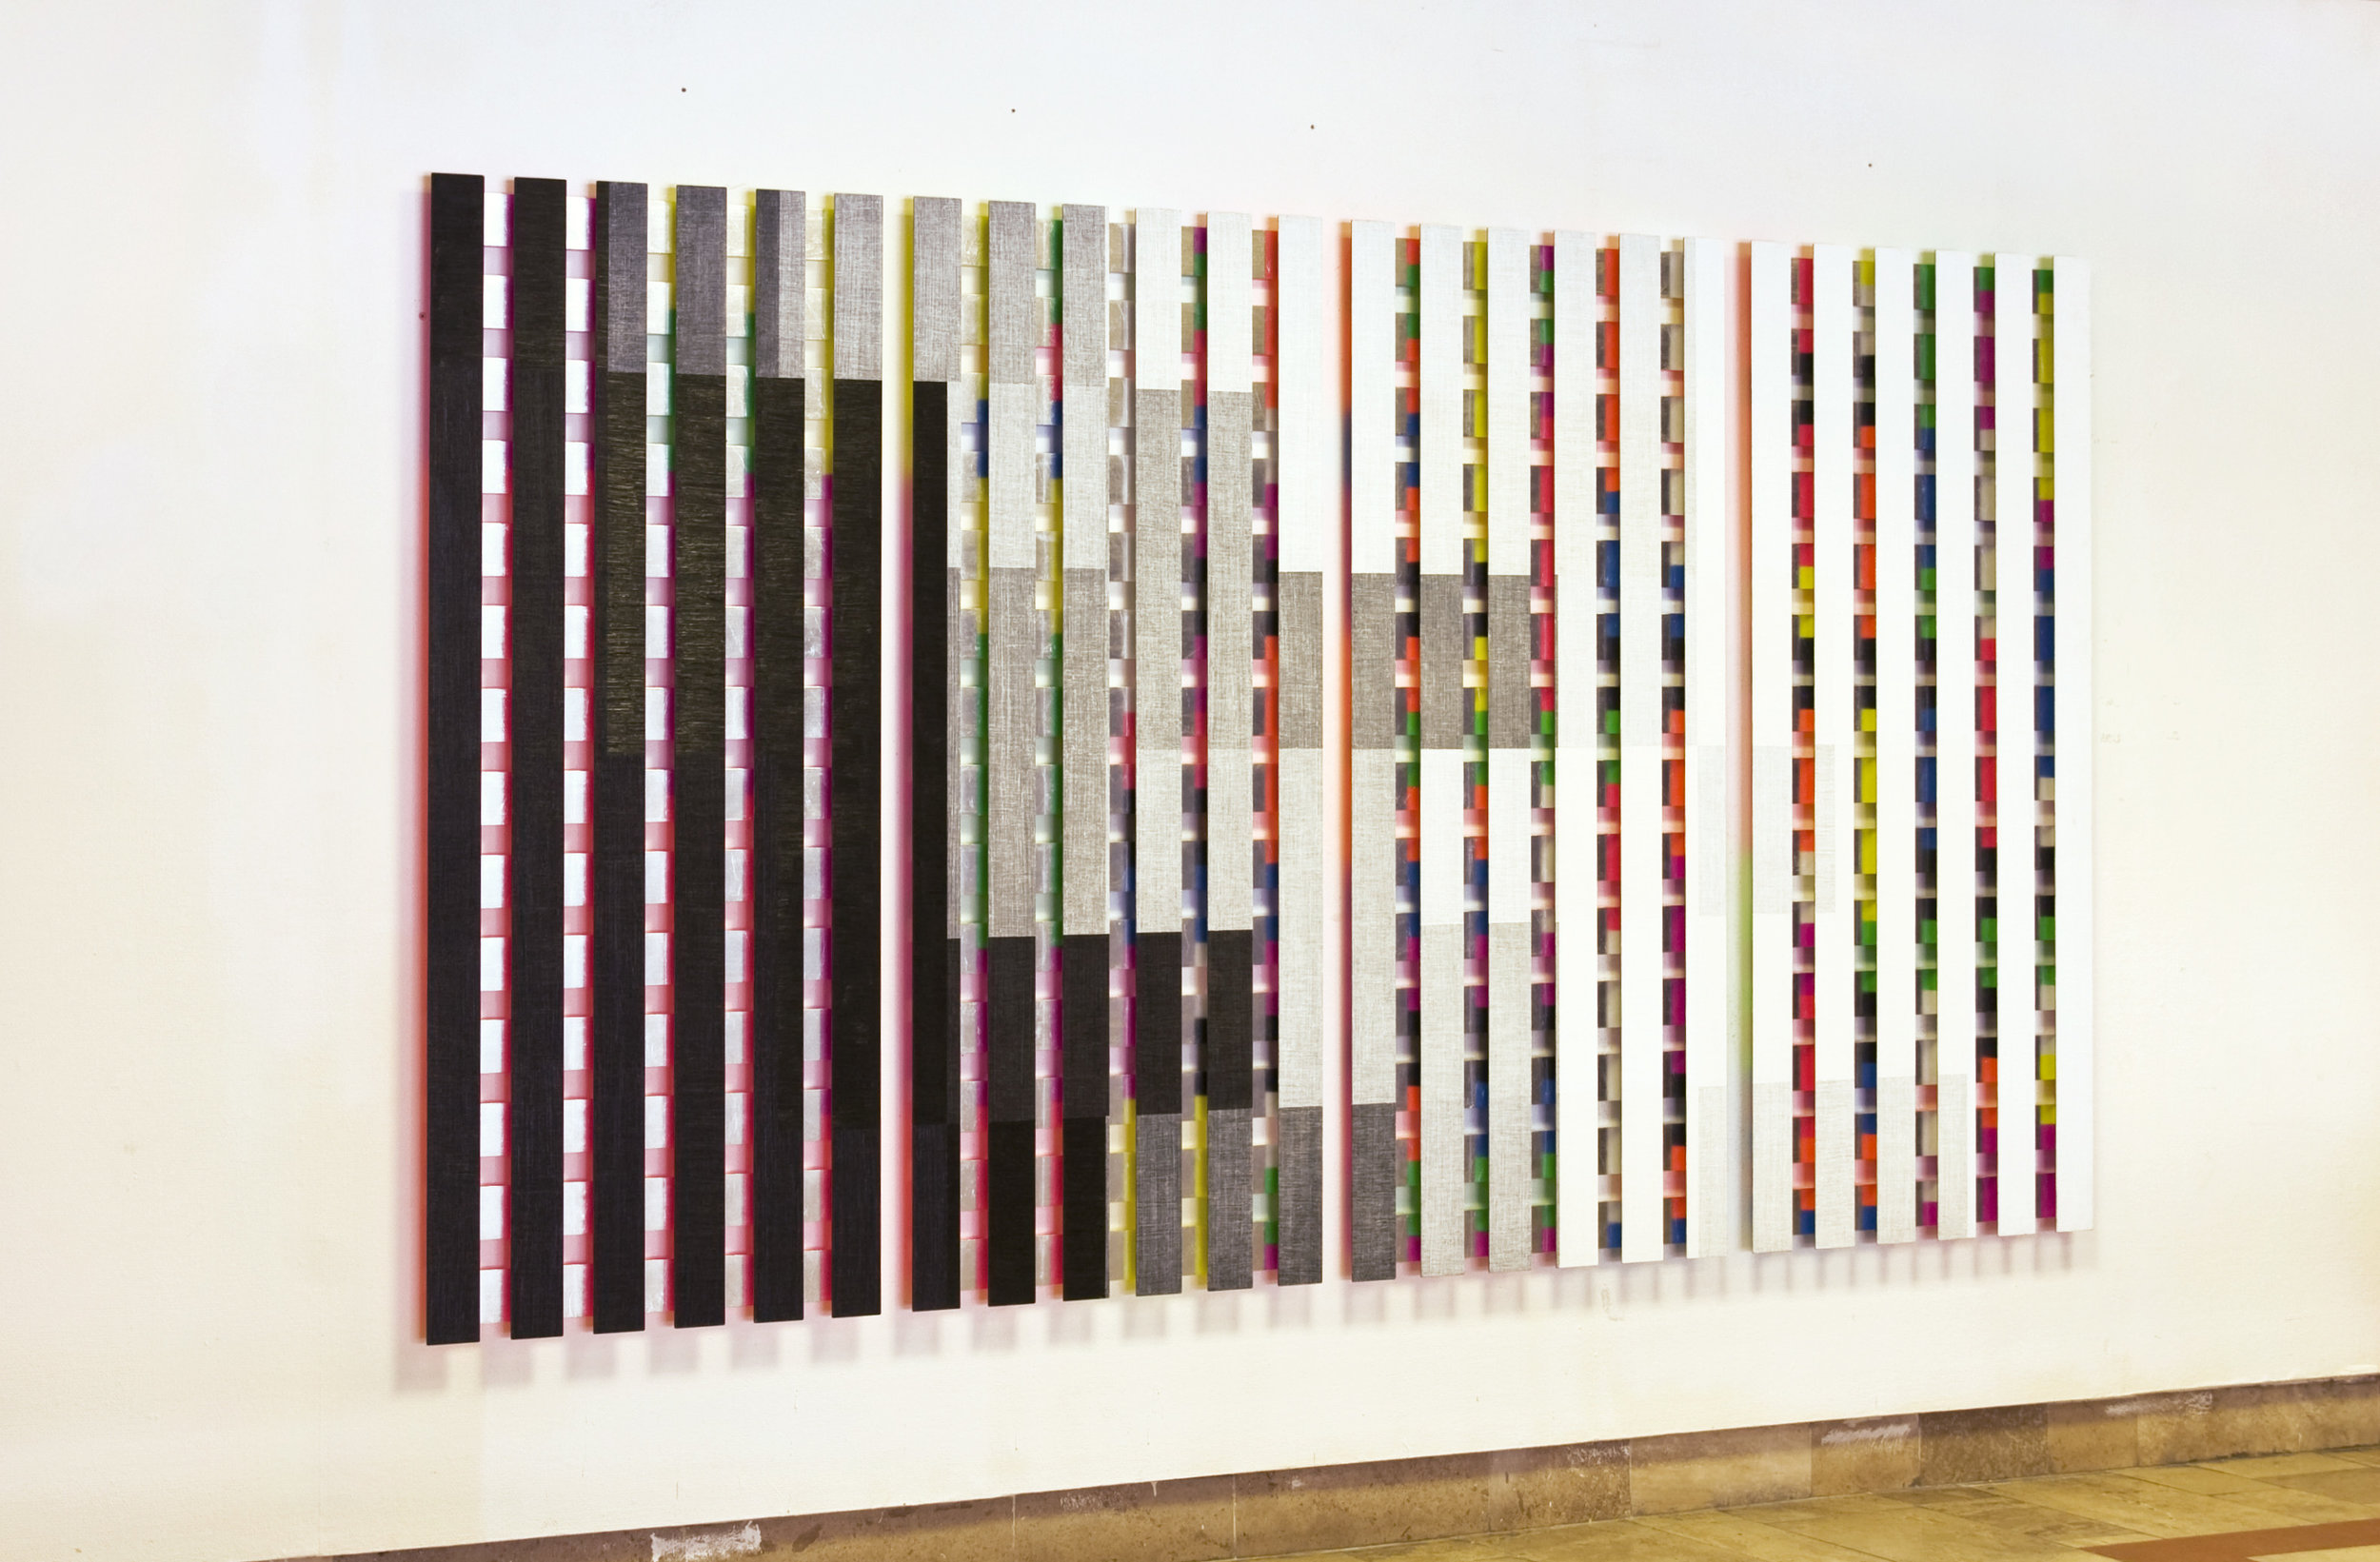 5k akril, les, 186 x 331 cm, 2010.jpg